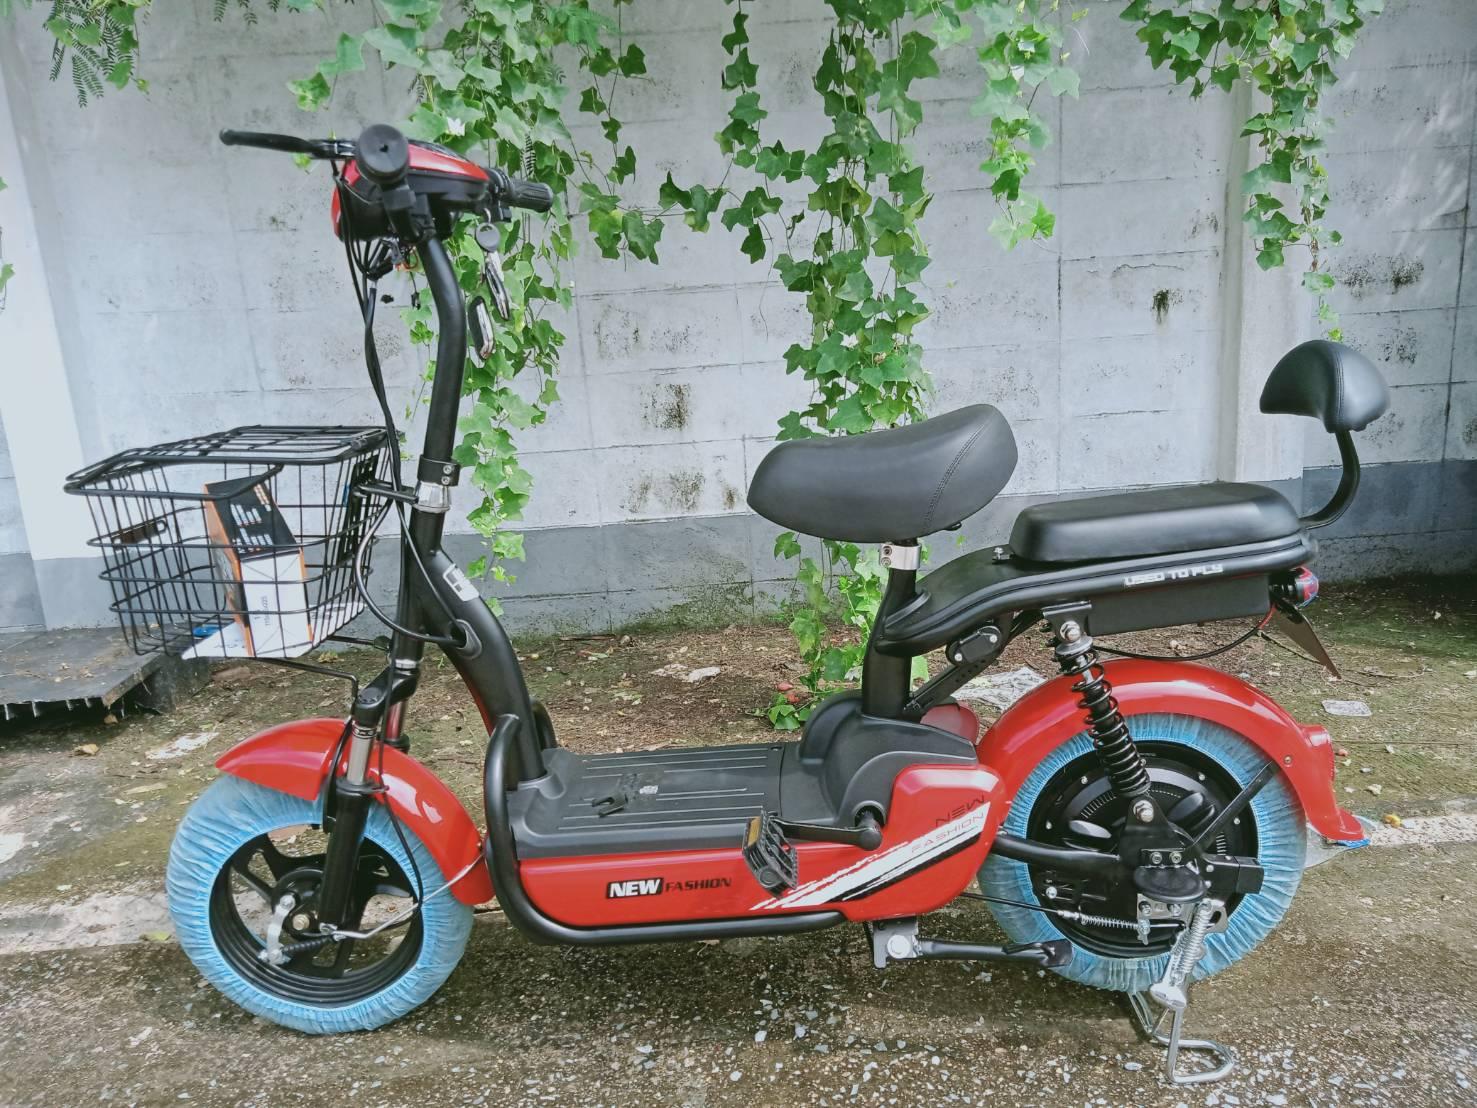 NONGLEK-i จักรยานไฟฟ้าสกู๊ตเตอร์ 350 วัตต์ 30 กม./ชม. 40 กม./ชาร์จ มีขาปั่น